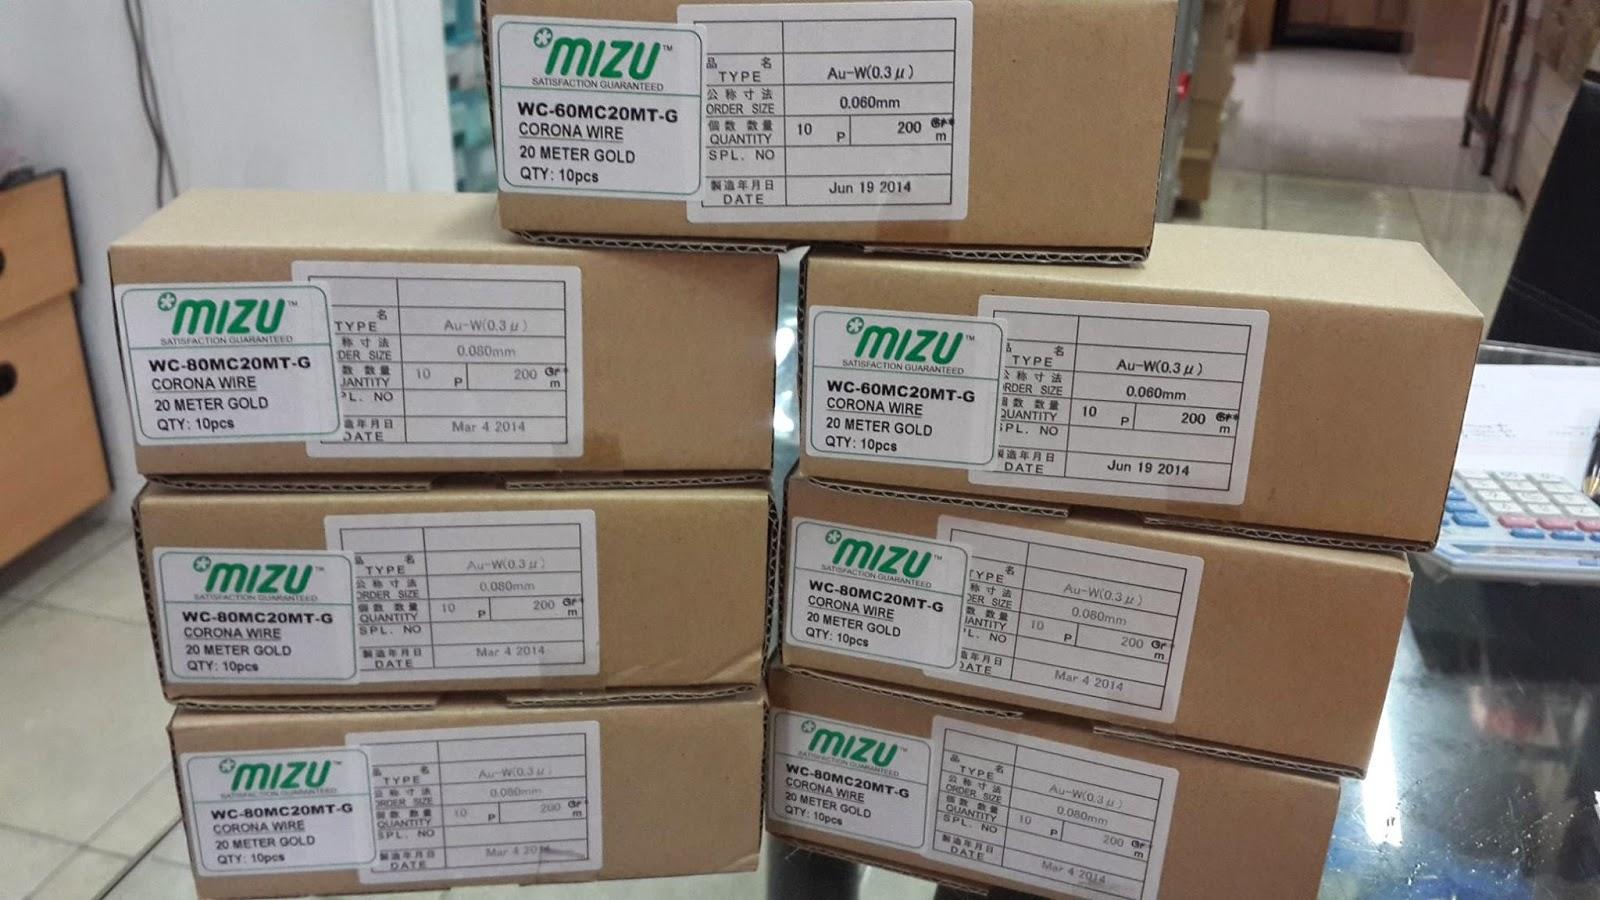 Yichang Shop Oxone Clasic Cookware Panci Set Best Seller Good Quality Perlengkapan Dapur Kode Ox 966 Berkah Judul Produk Corona Wayer Mizu